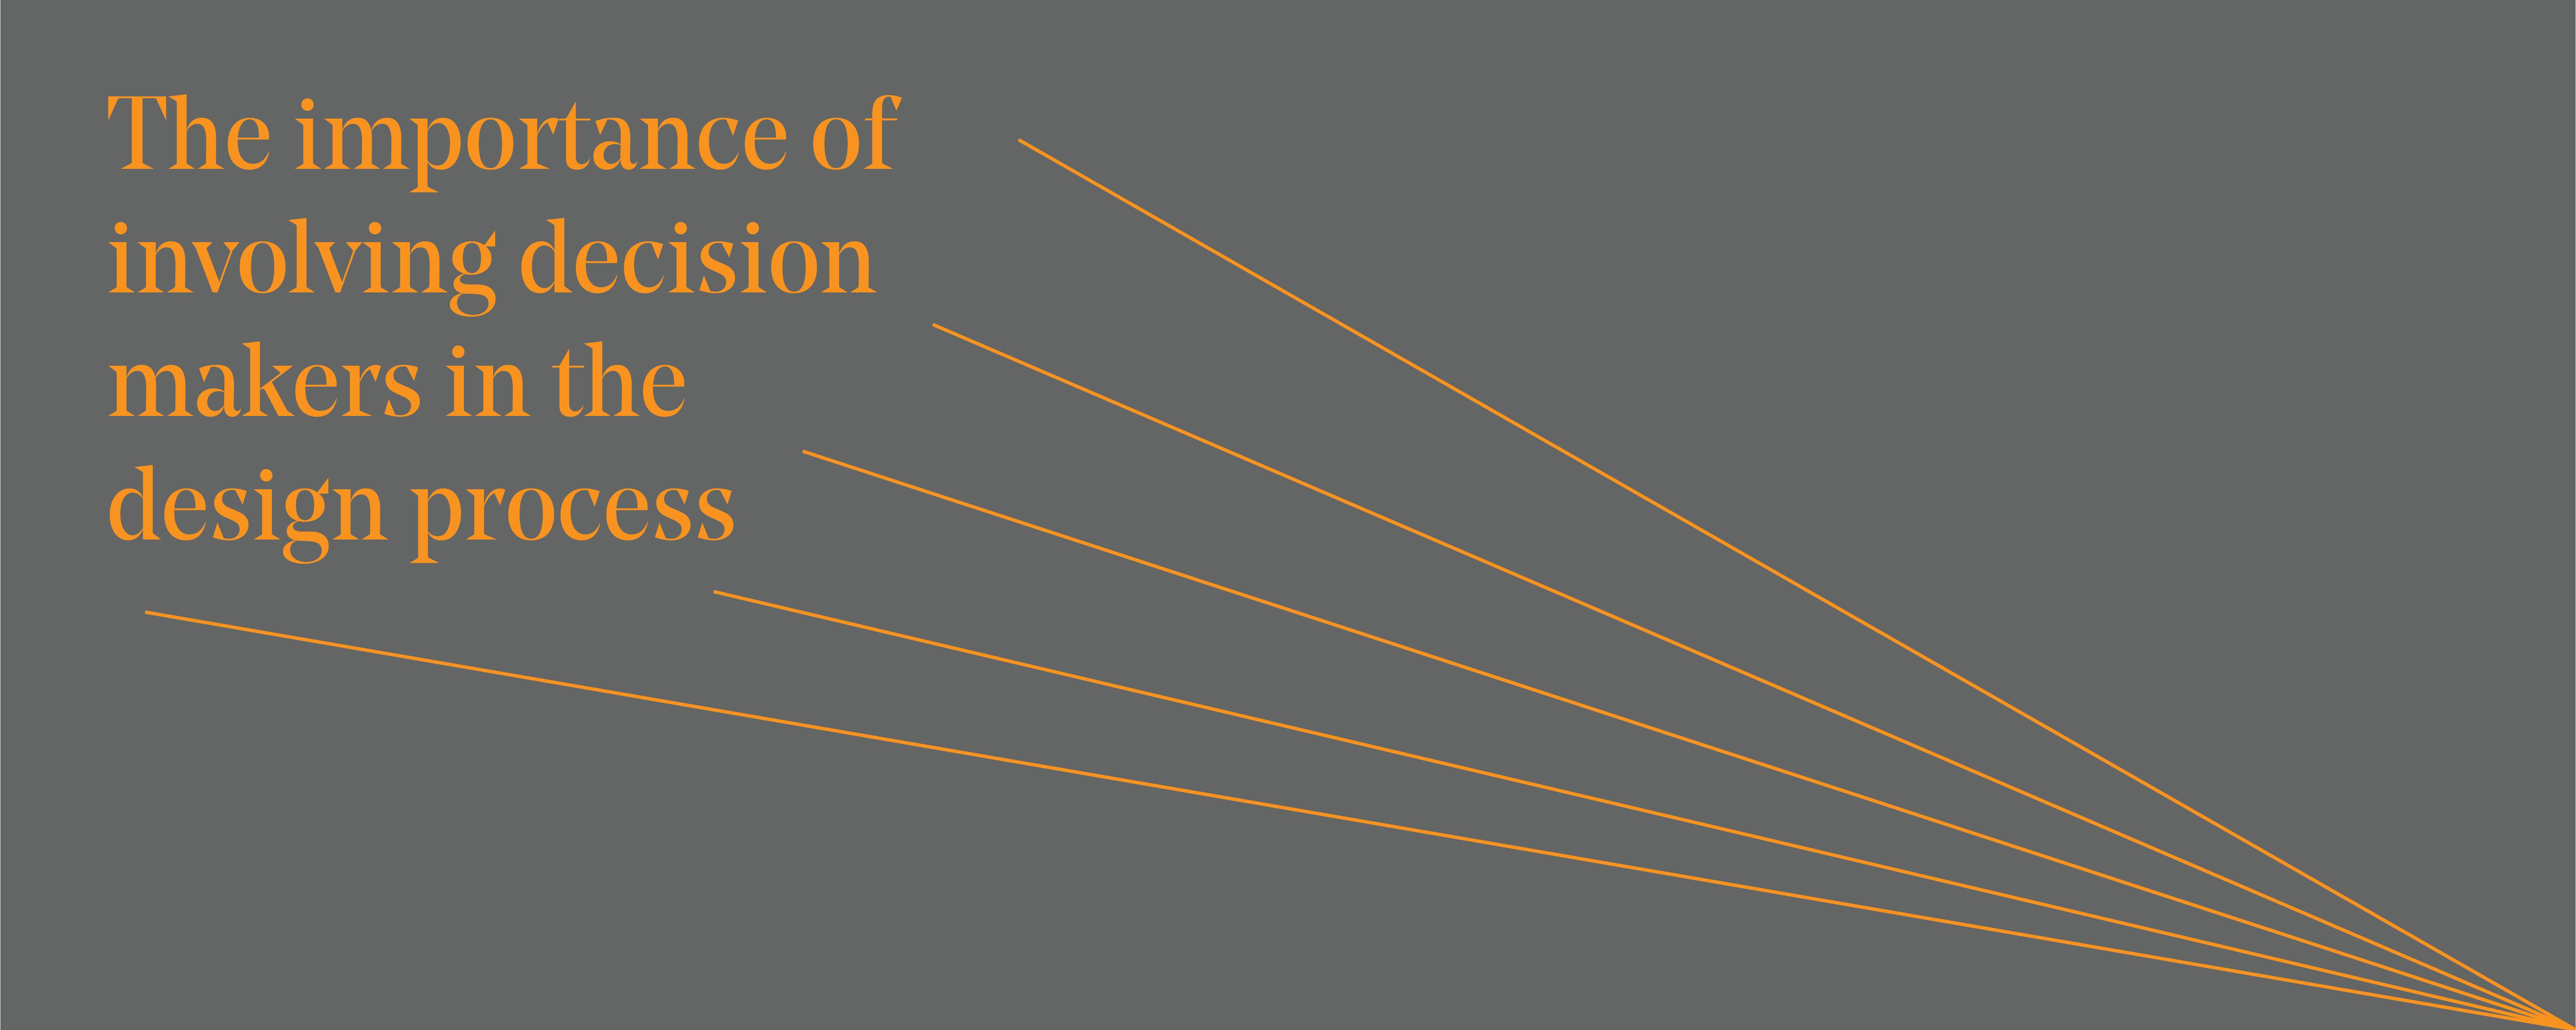 Business-decision-design-process-bitflow-HorBanner-05